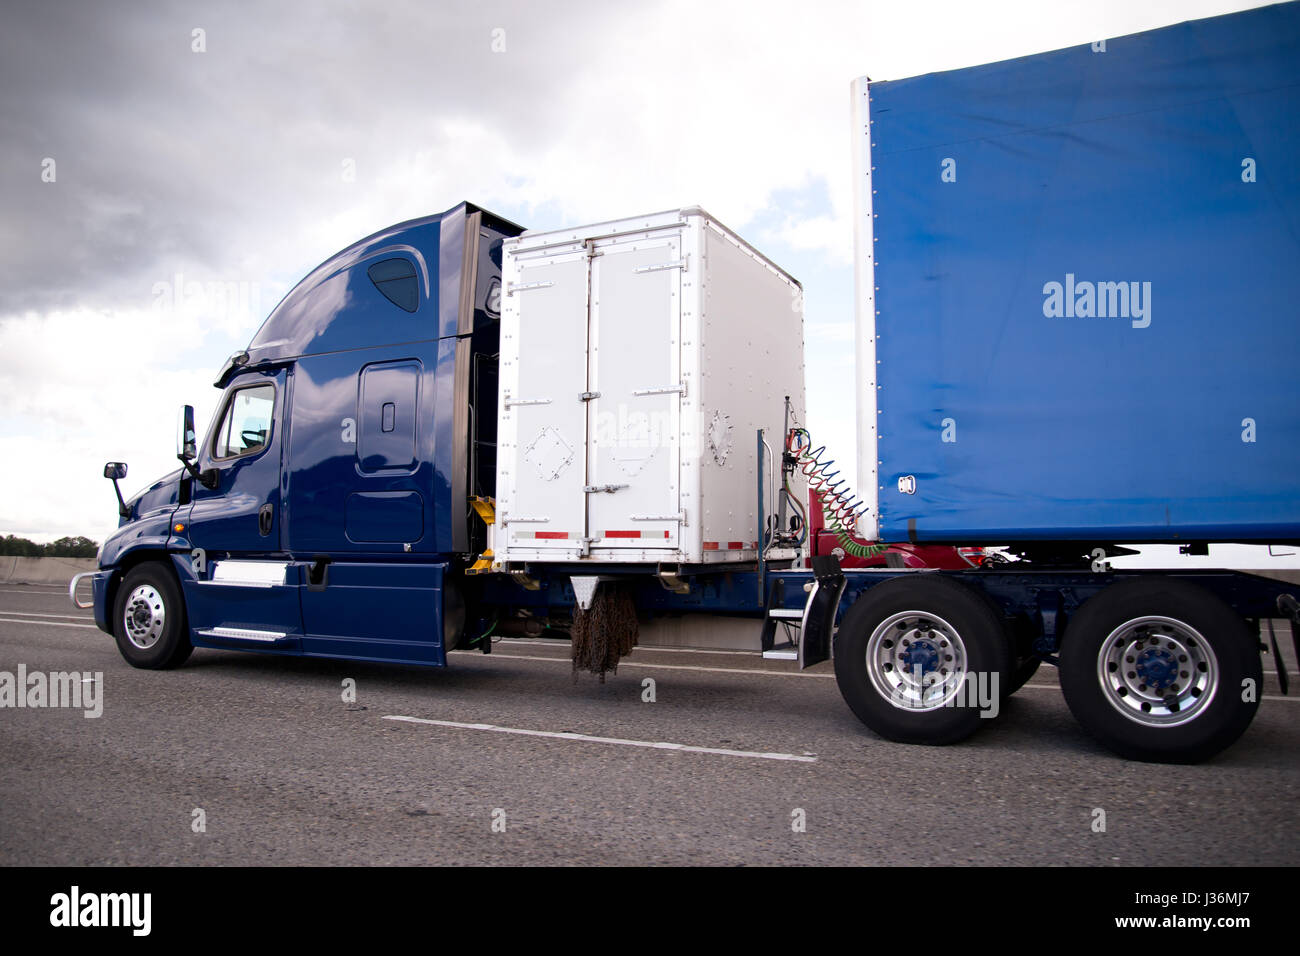 semi truck trailer van box stock photos u0026 semi truck trailer van